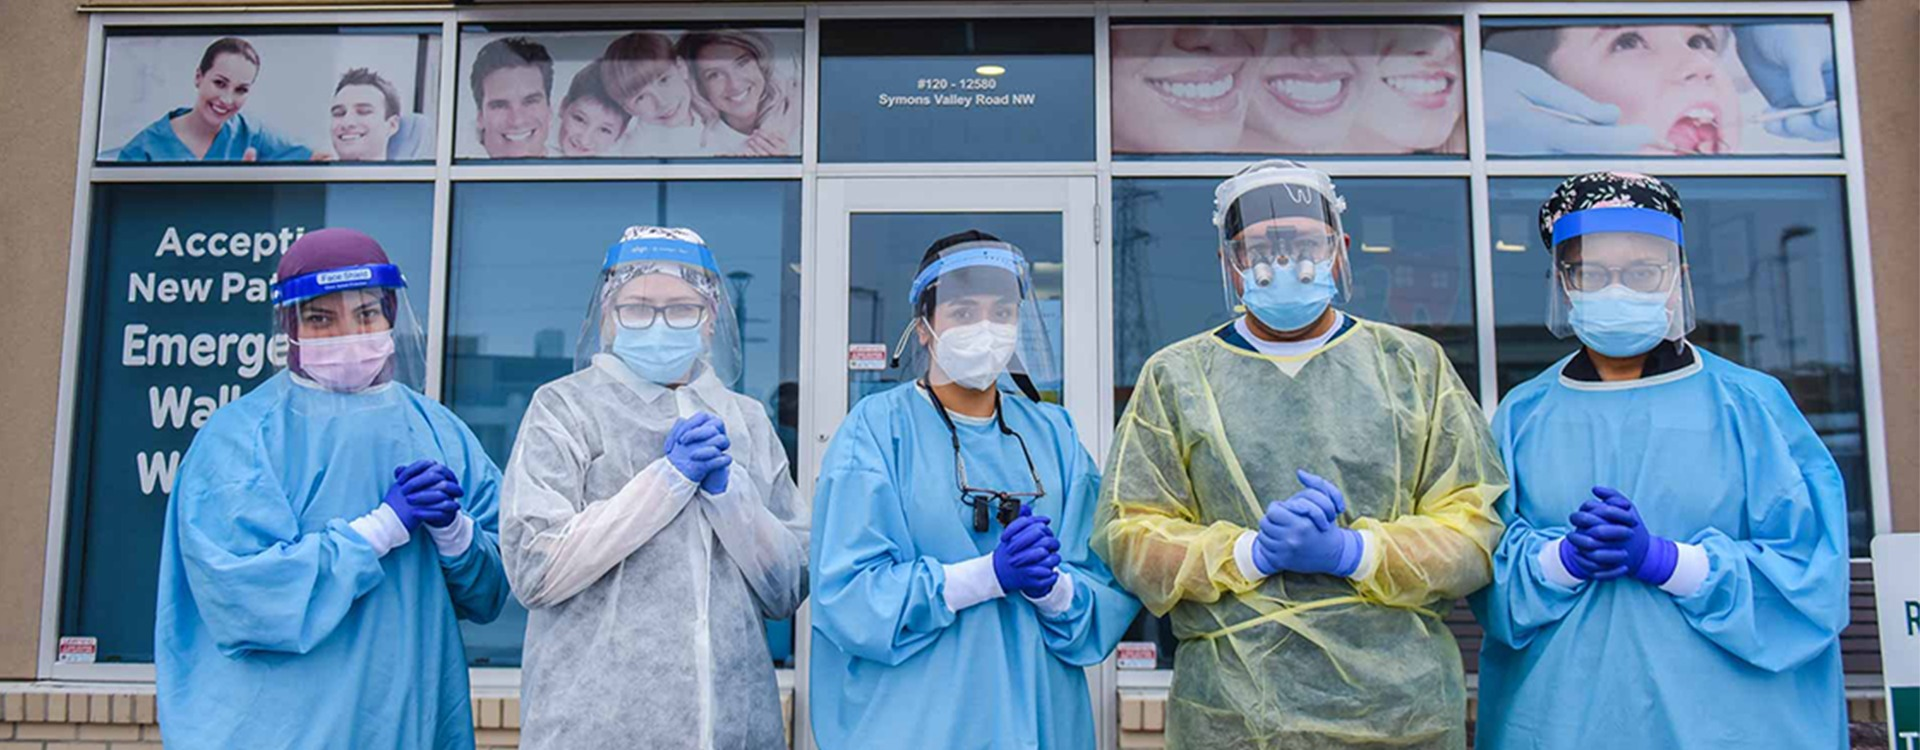 Meet the Dental Team | Toothville Family Dentistry | NW Calgary | General Dentist